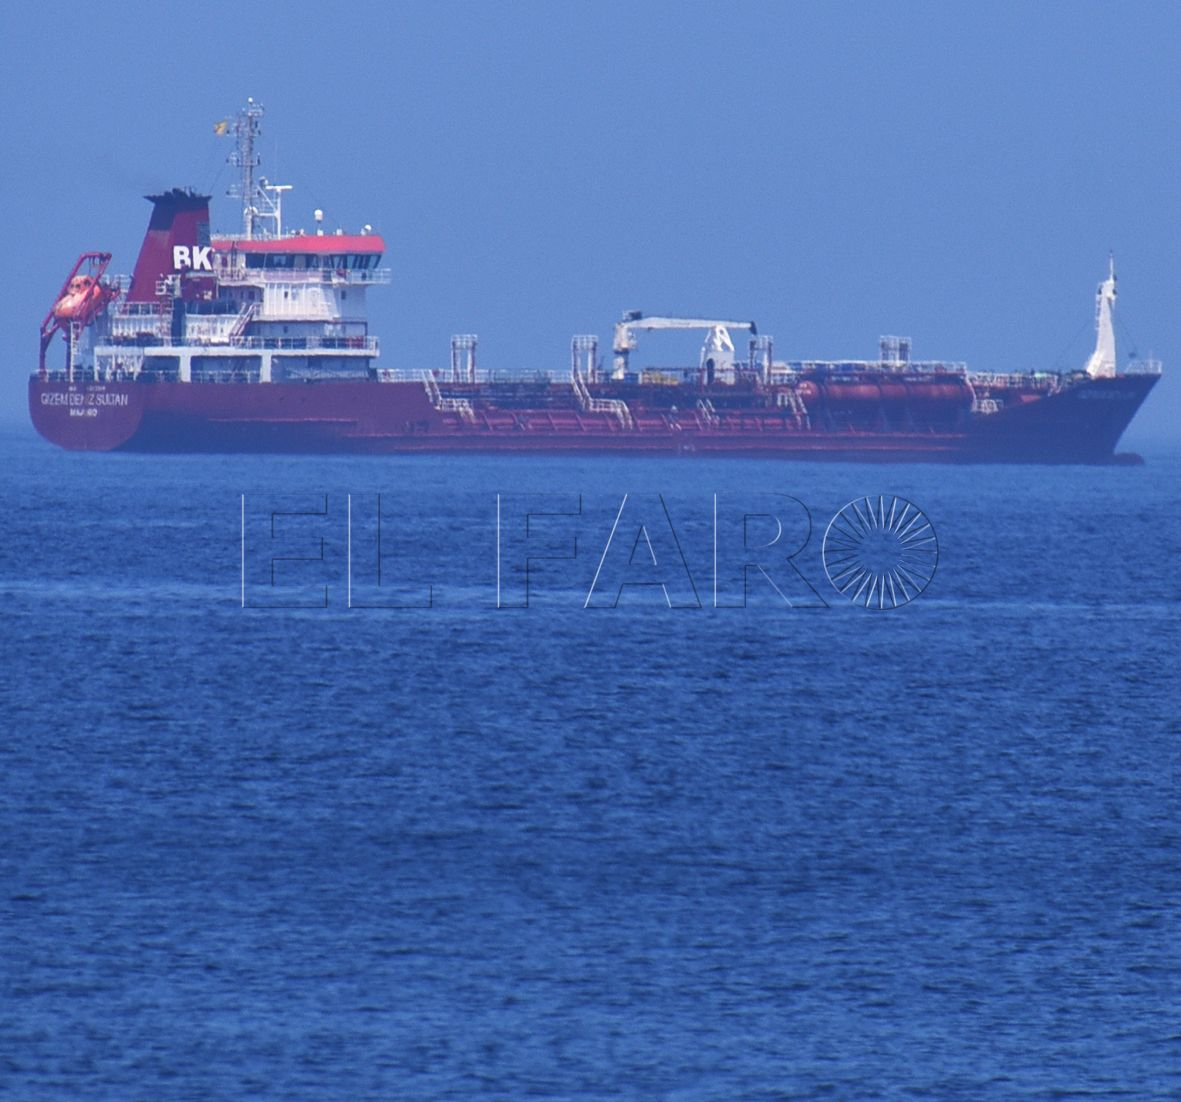 Petrolero, de vuelta a Ceuta